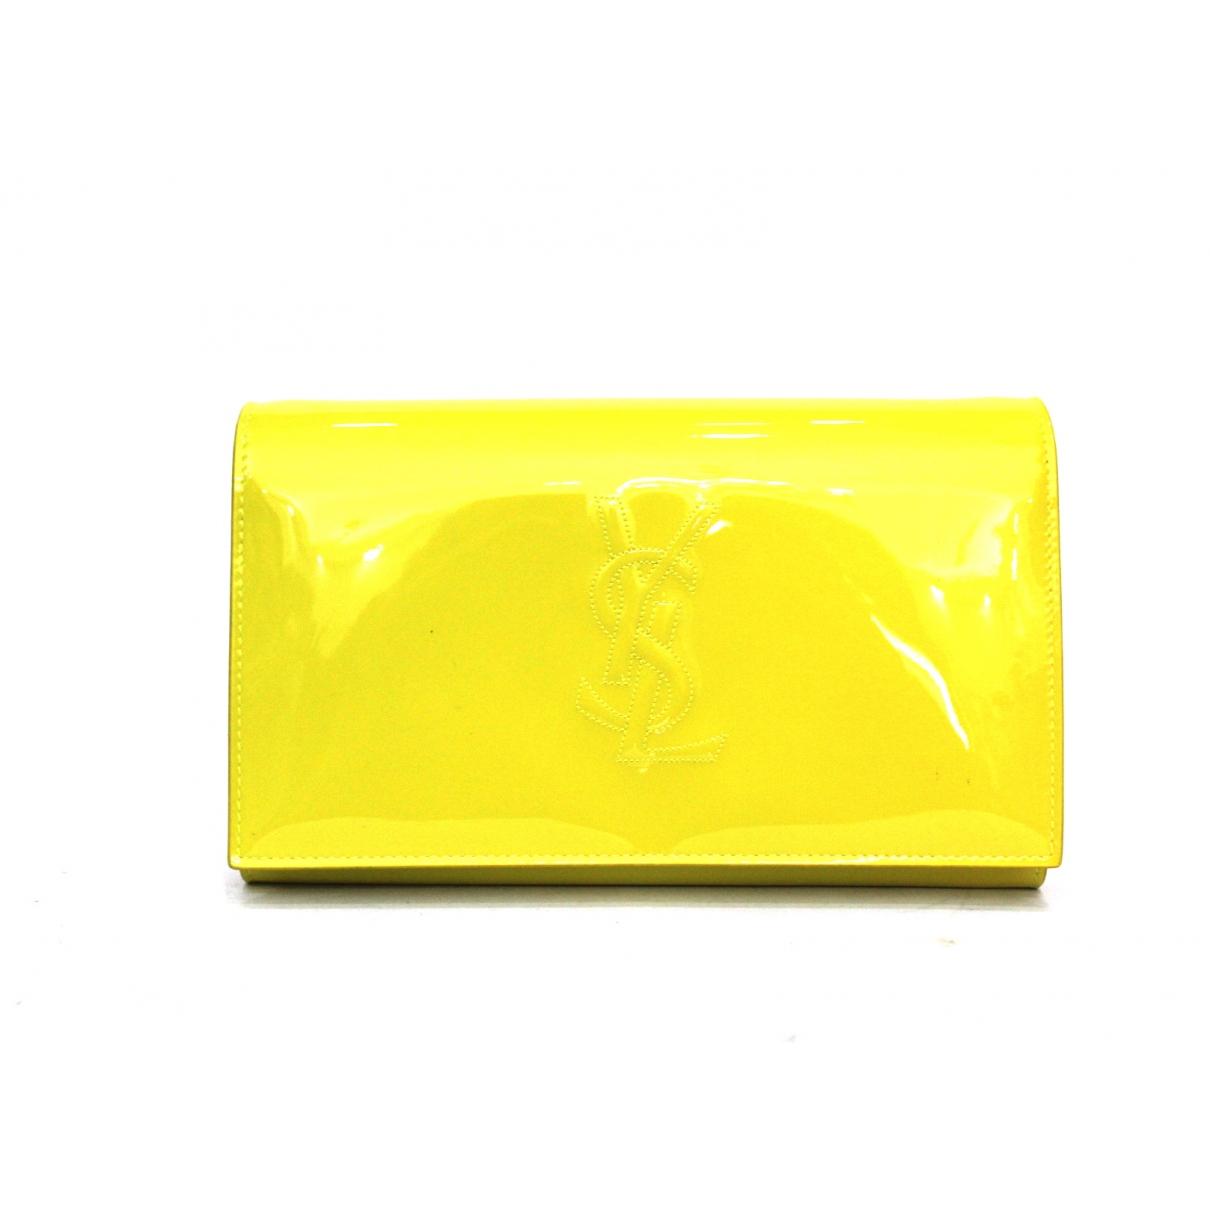 Yves Saint Laurent Belle de Jour Clutch in  Gelb Lackleder